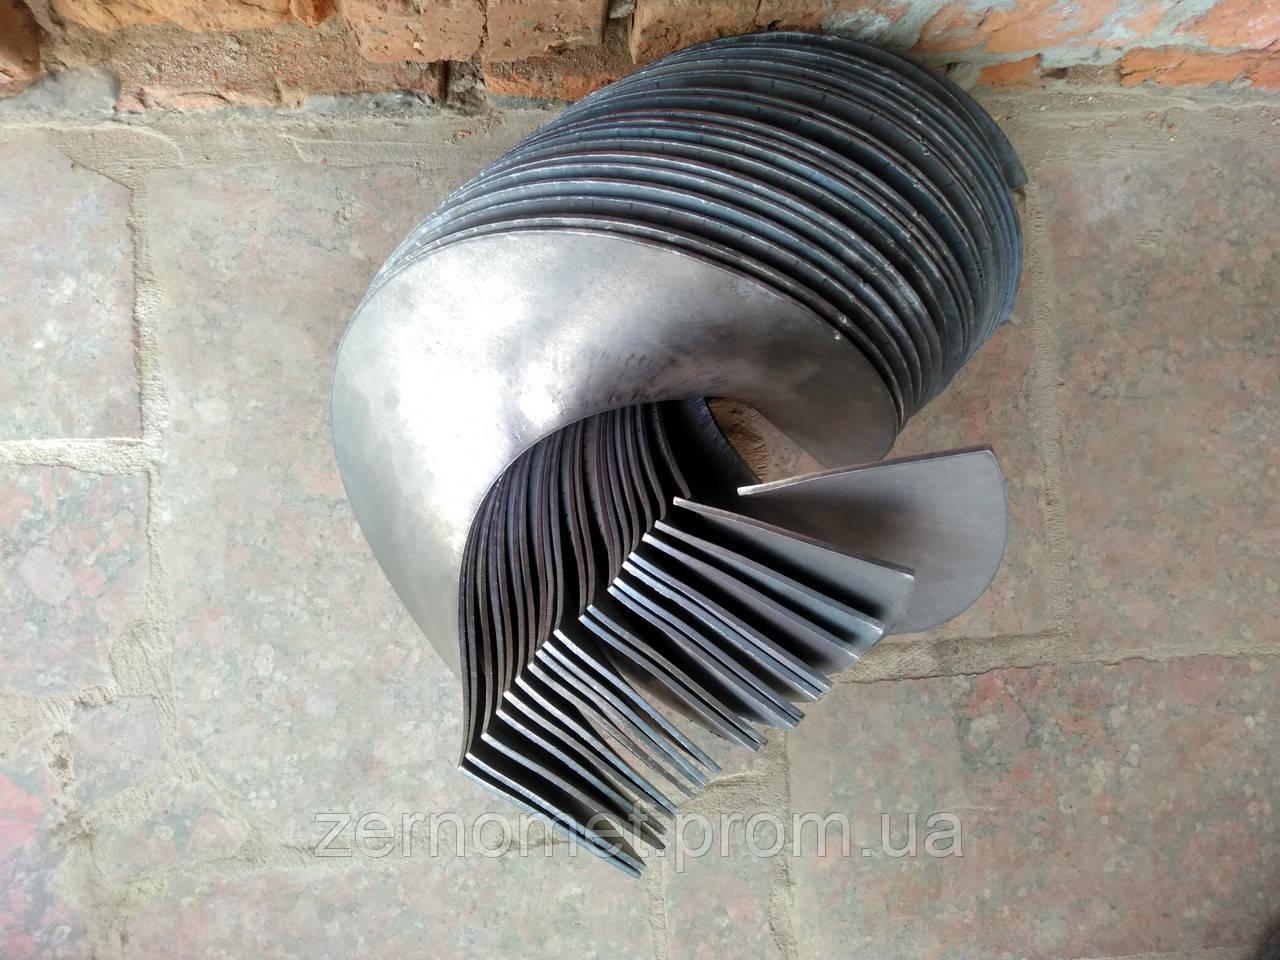 Виток шнека О-300 толщина 3мм